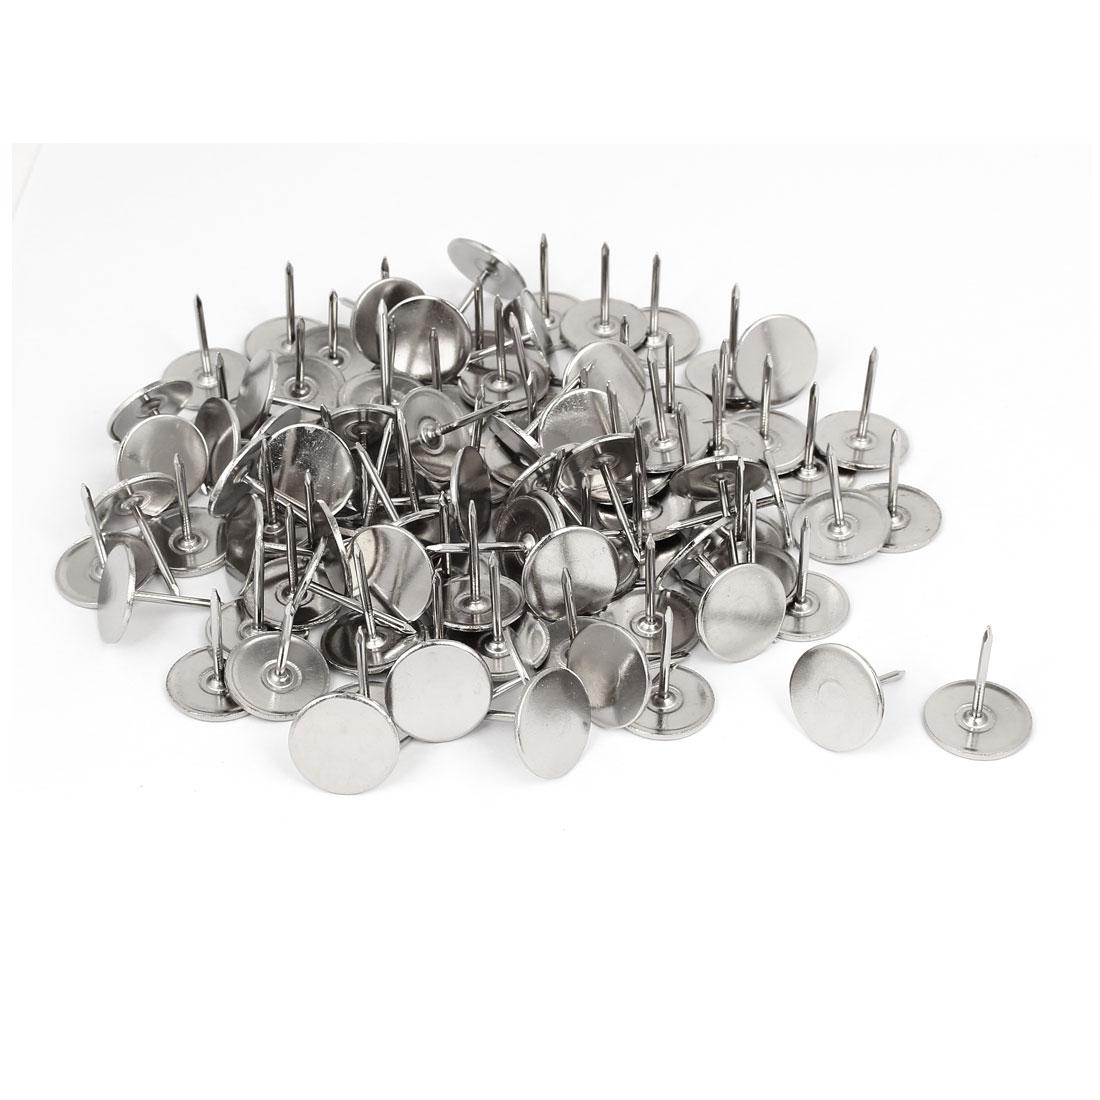 Furniture Metal Round Flat Head Upholstery Tack Nail Silver Tone 19mm Dia 100pcs